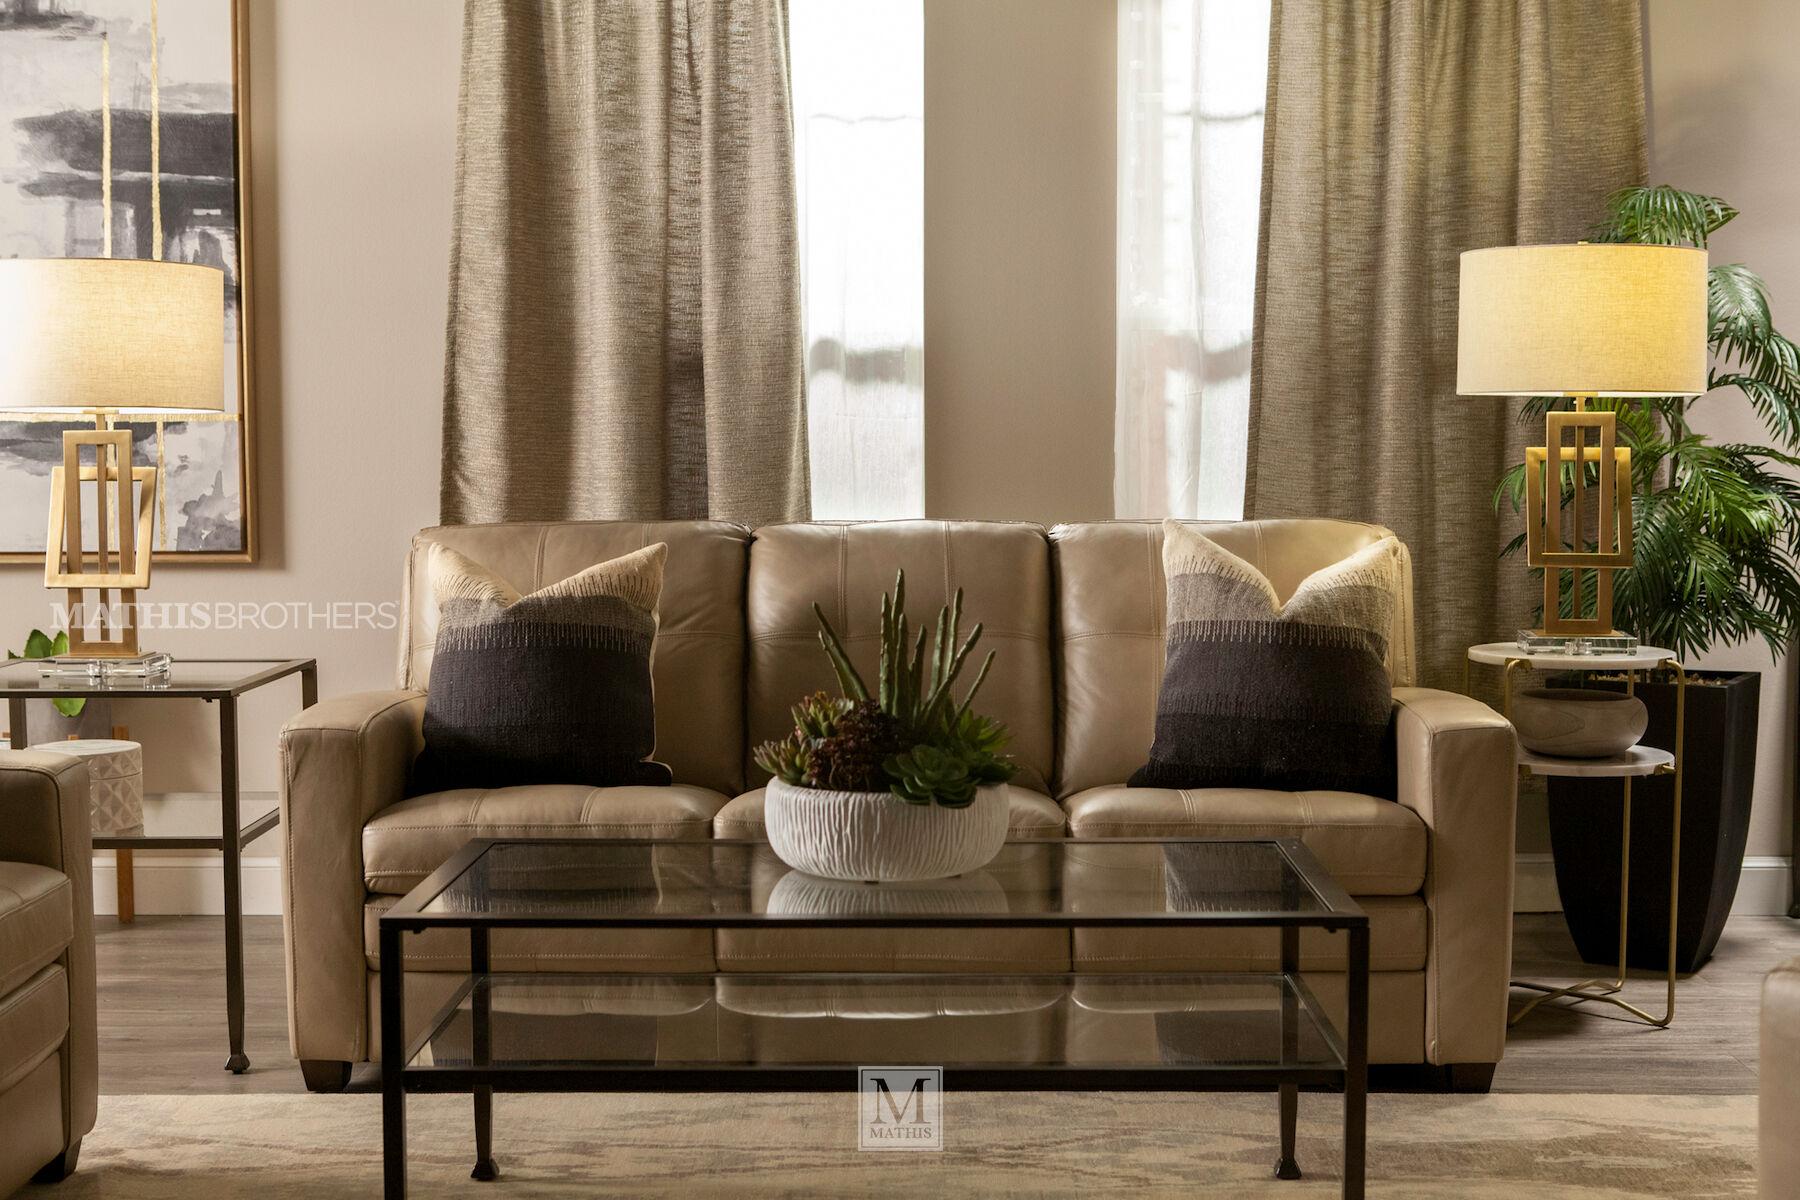 ... Leather Tufted 82u0026quot; Sofa In Beige